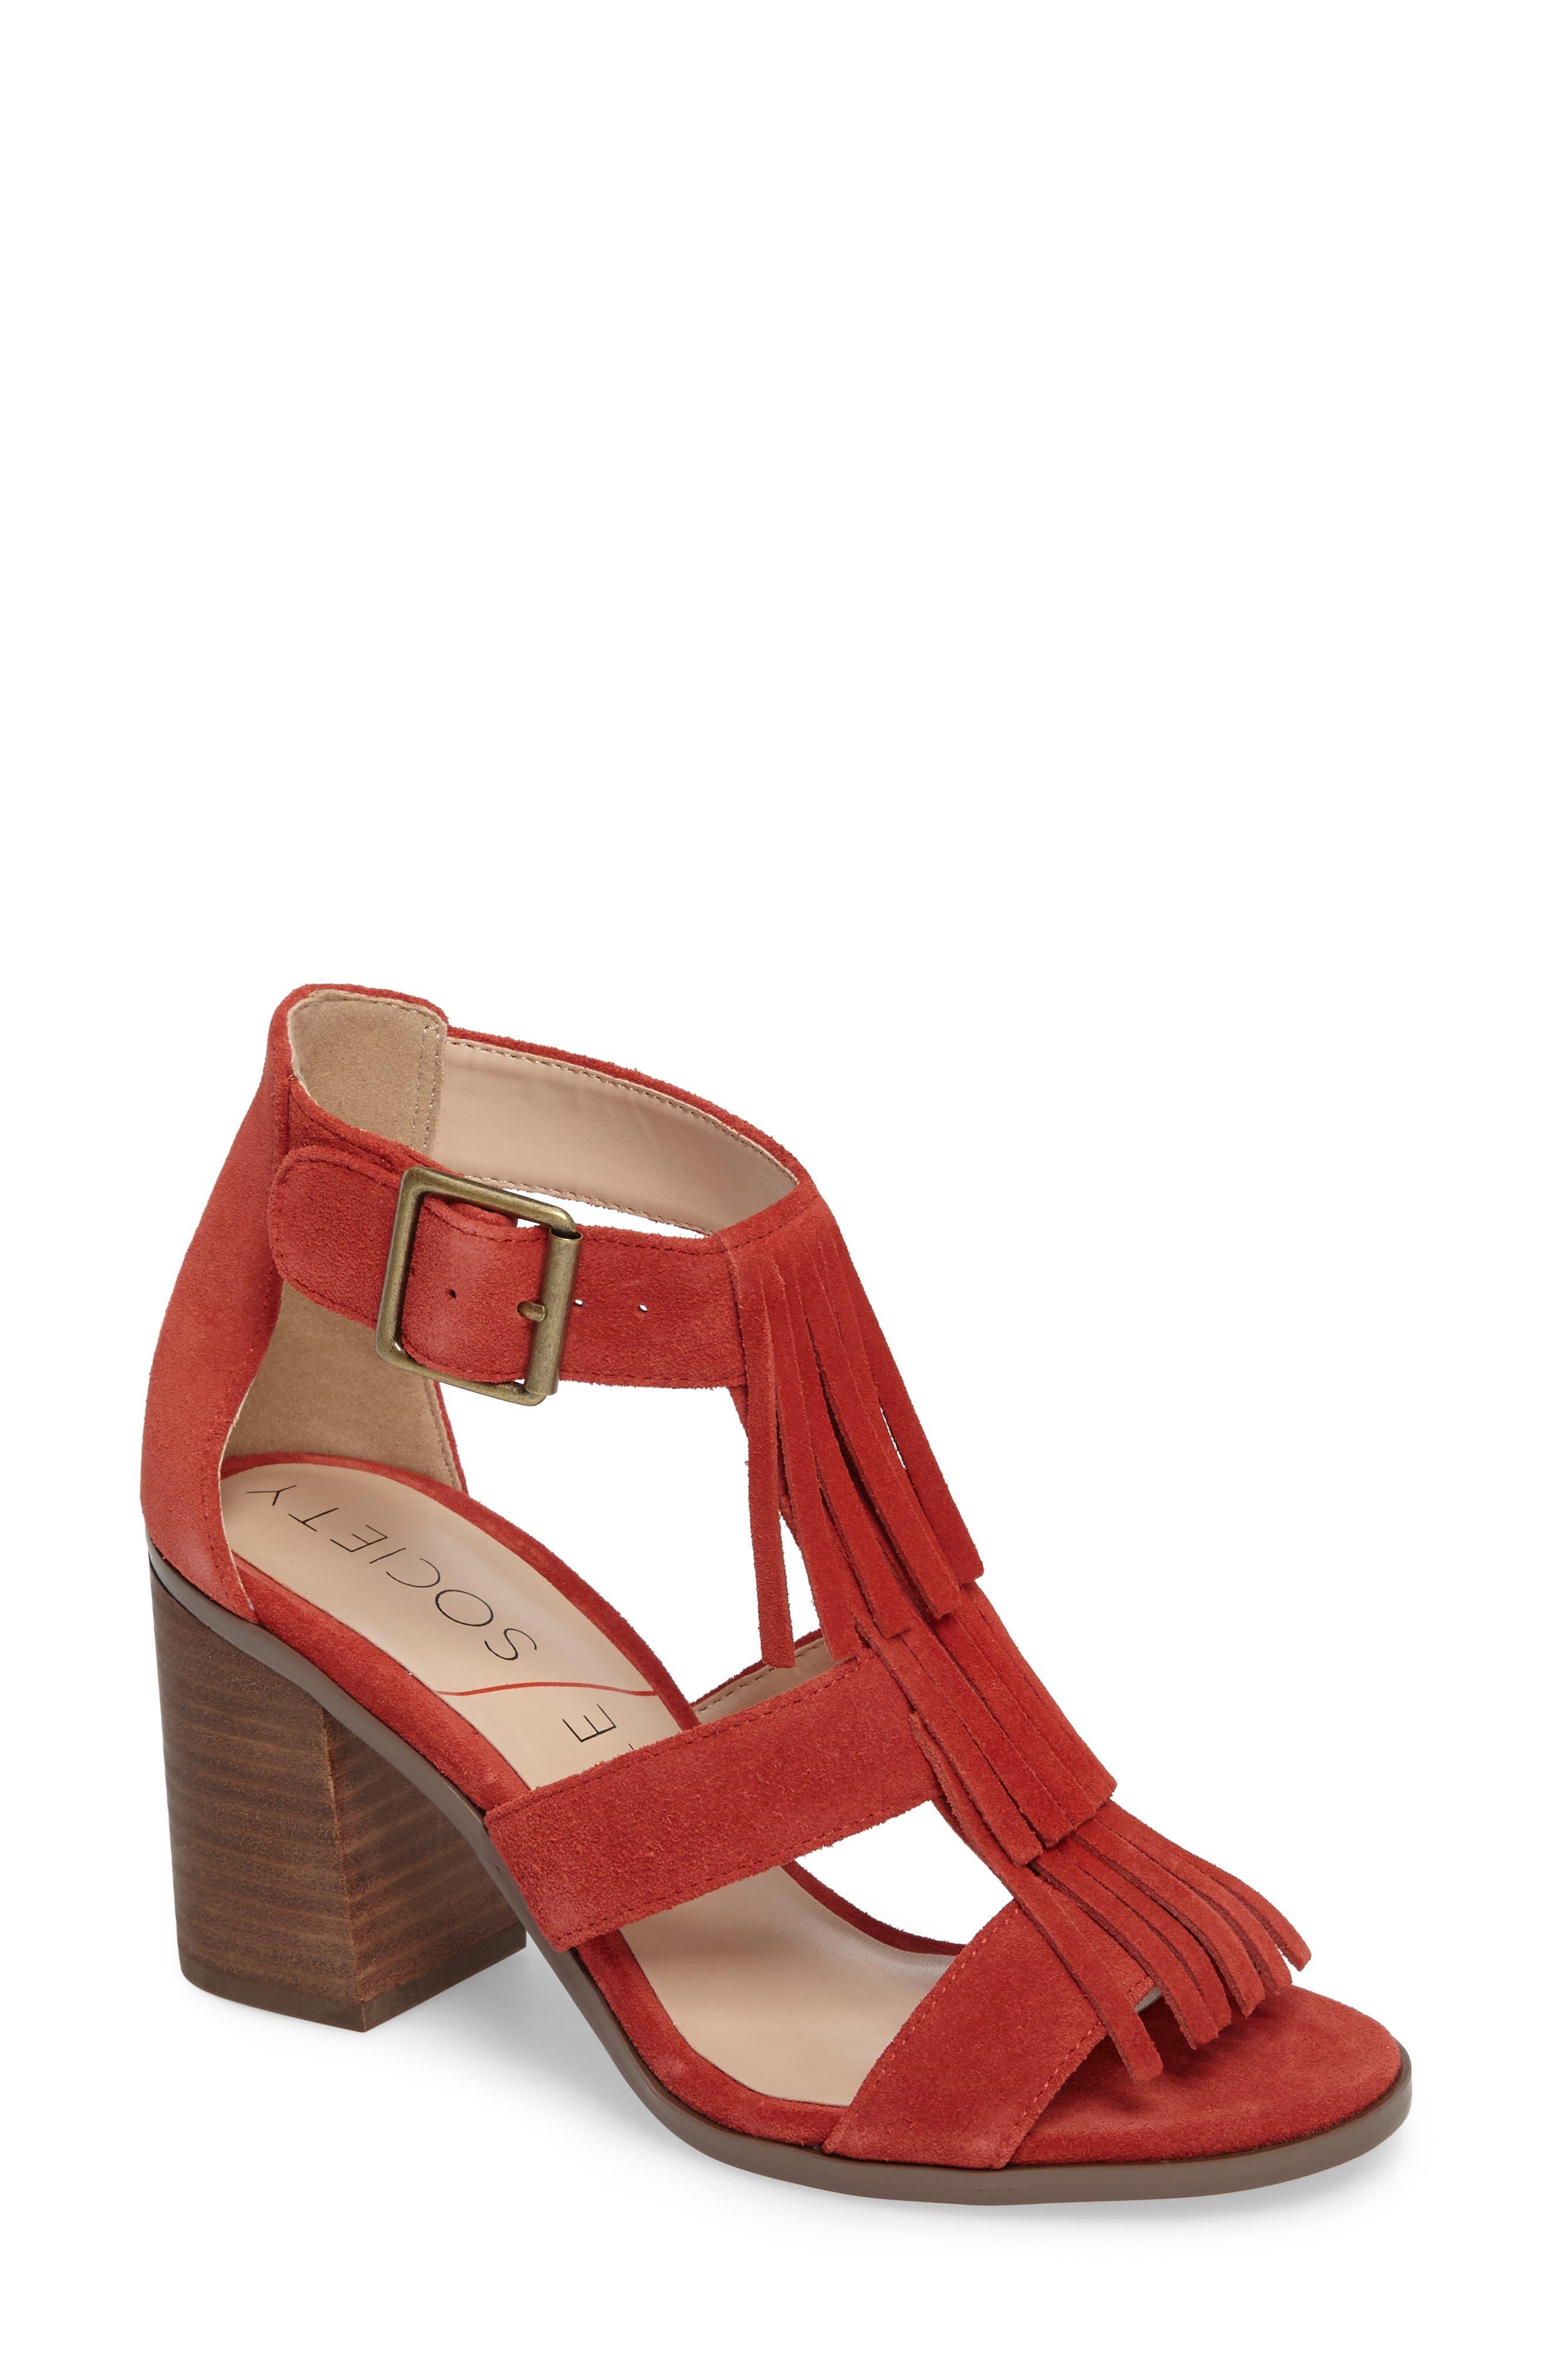 SOLE SOCIETY Delilah Fringe Sandal